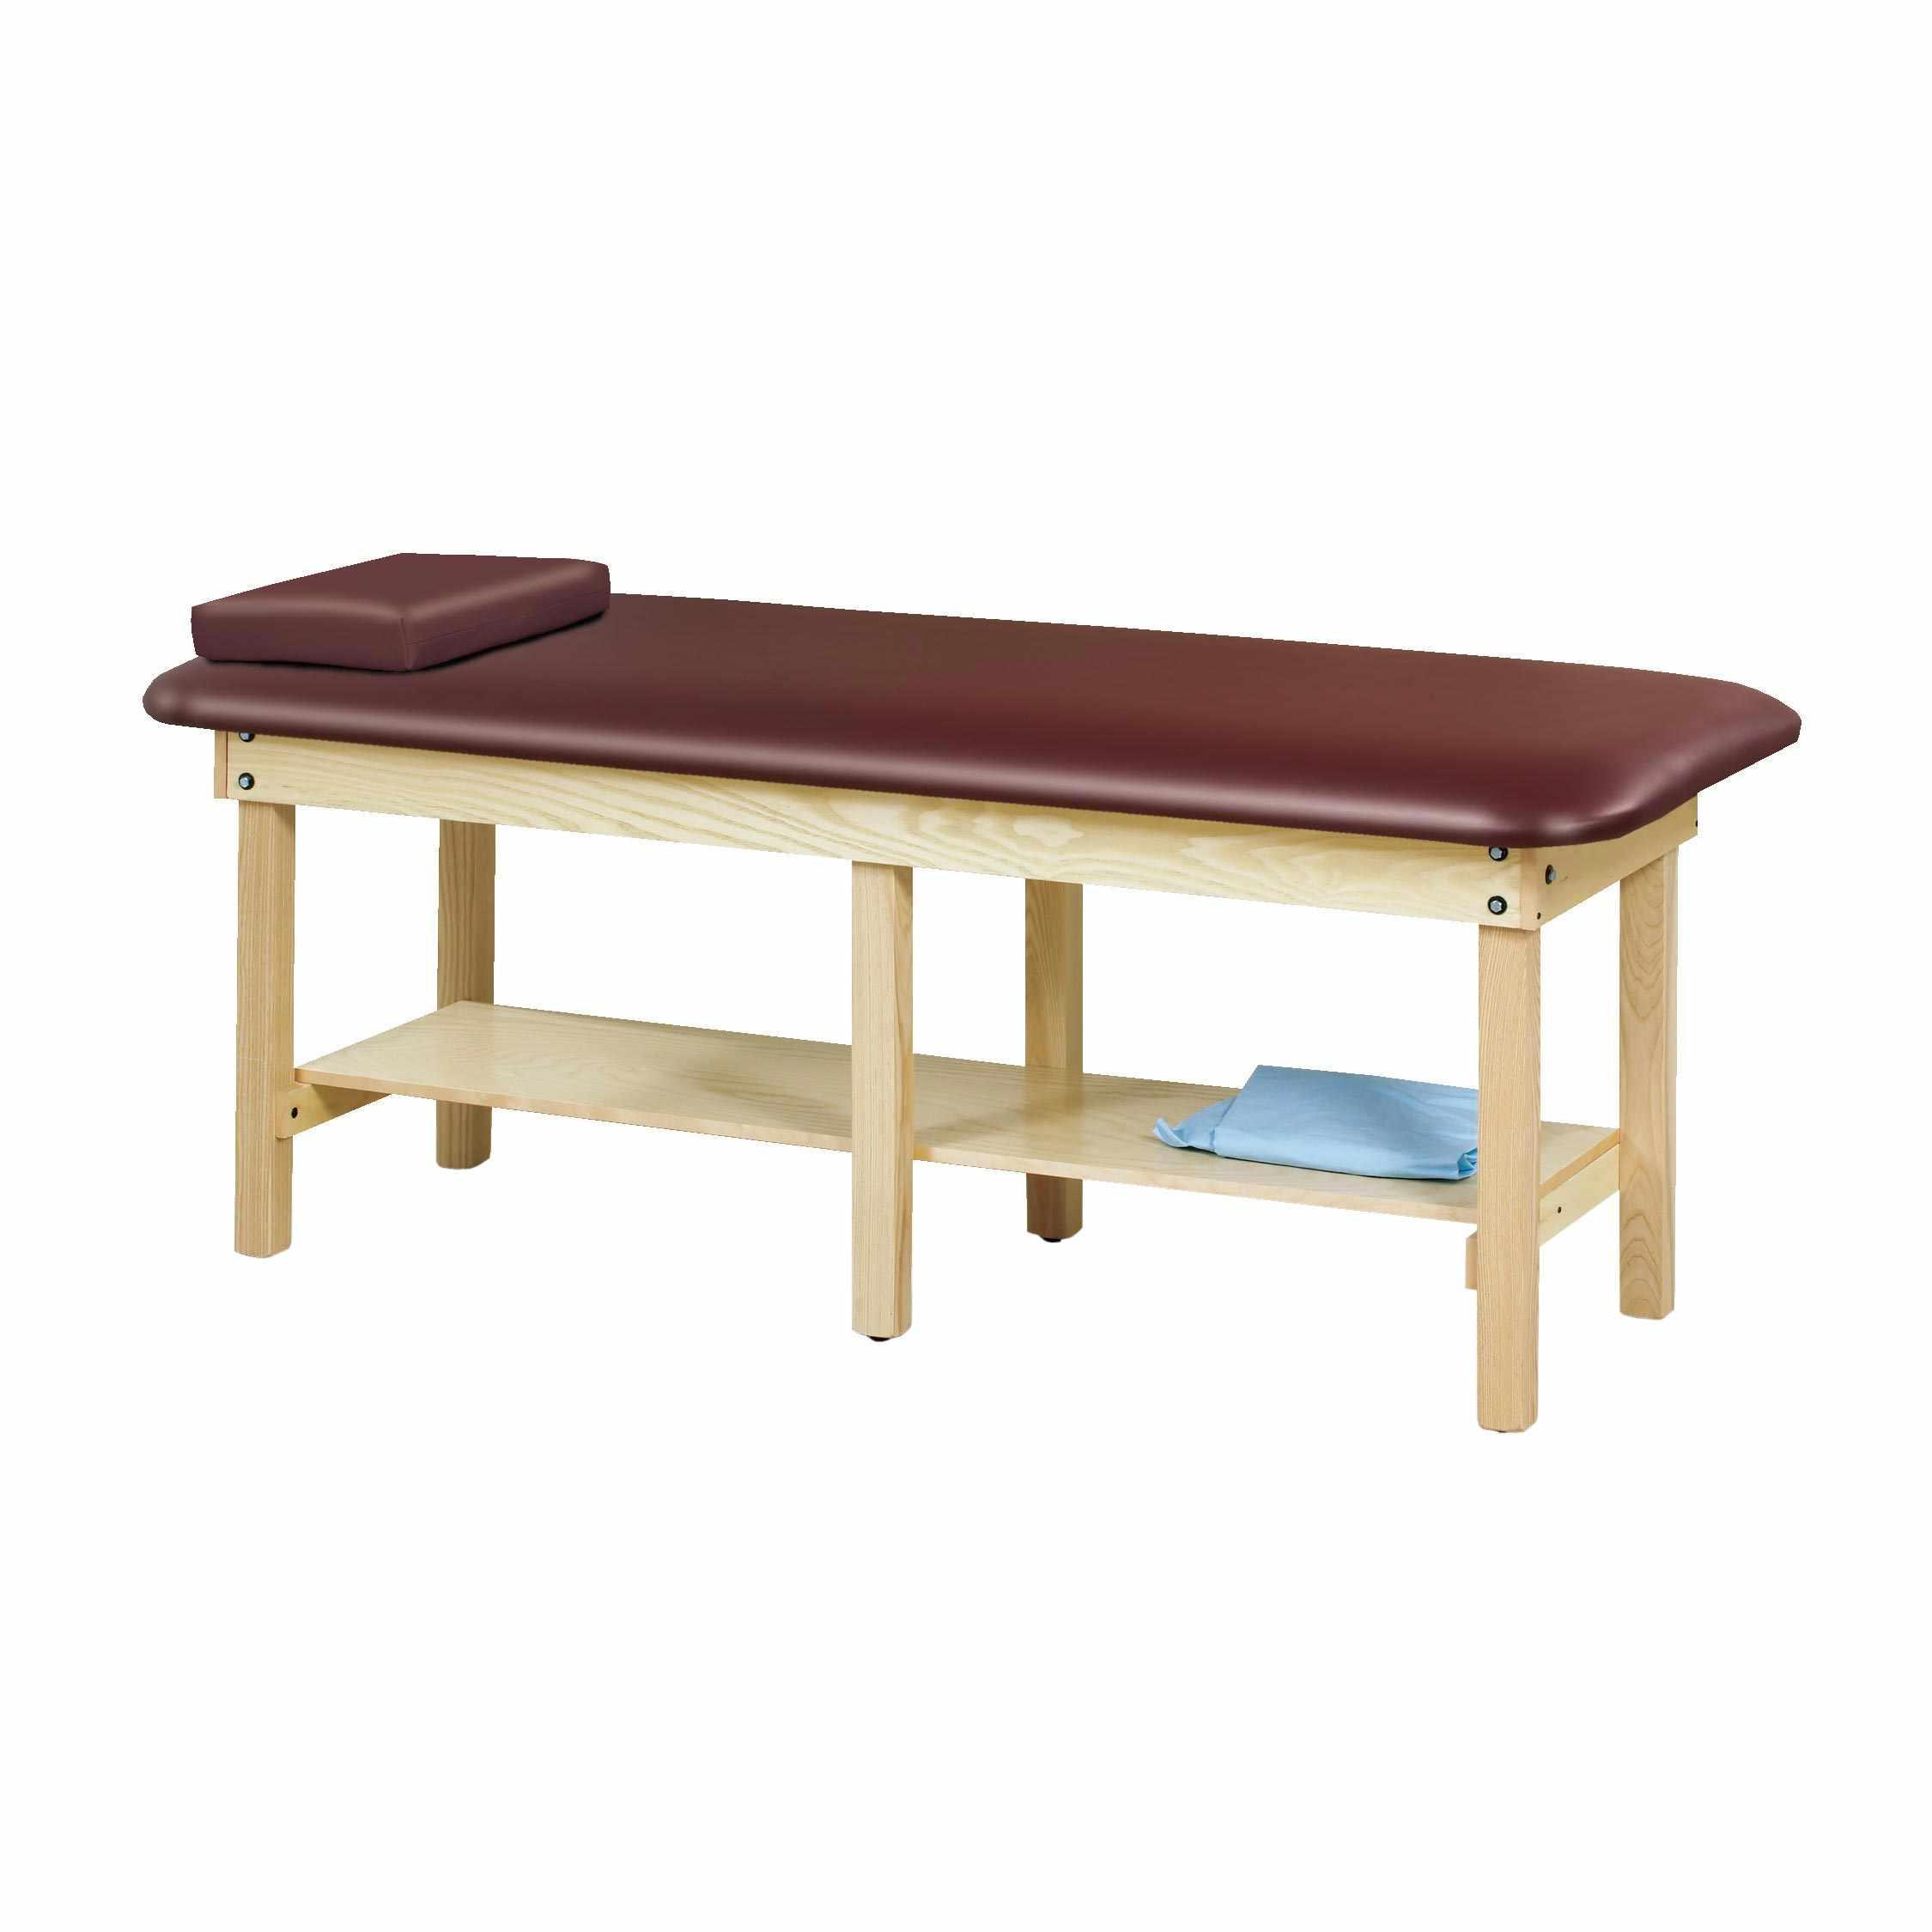 Clinton treatment table with 6 legs